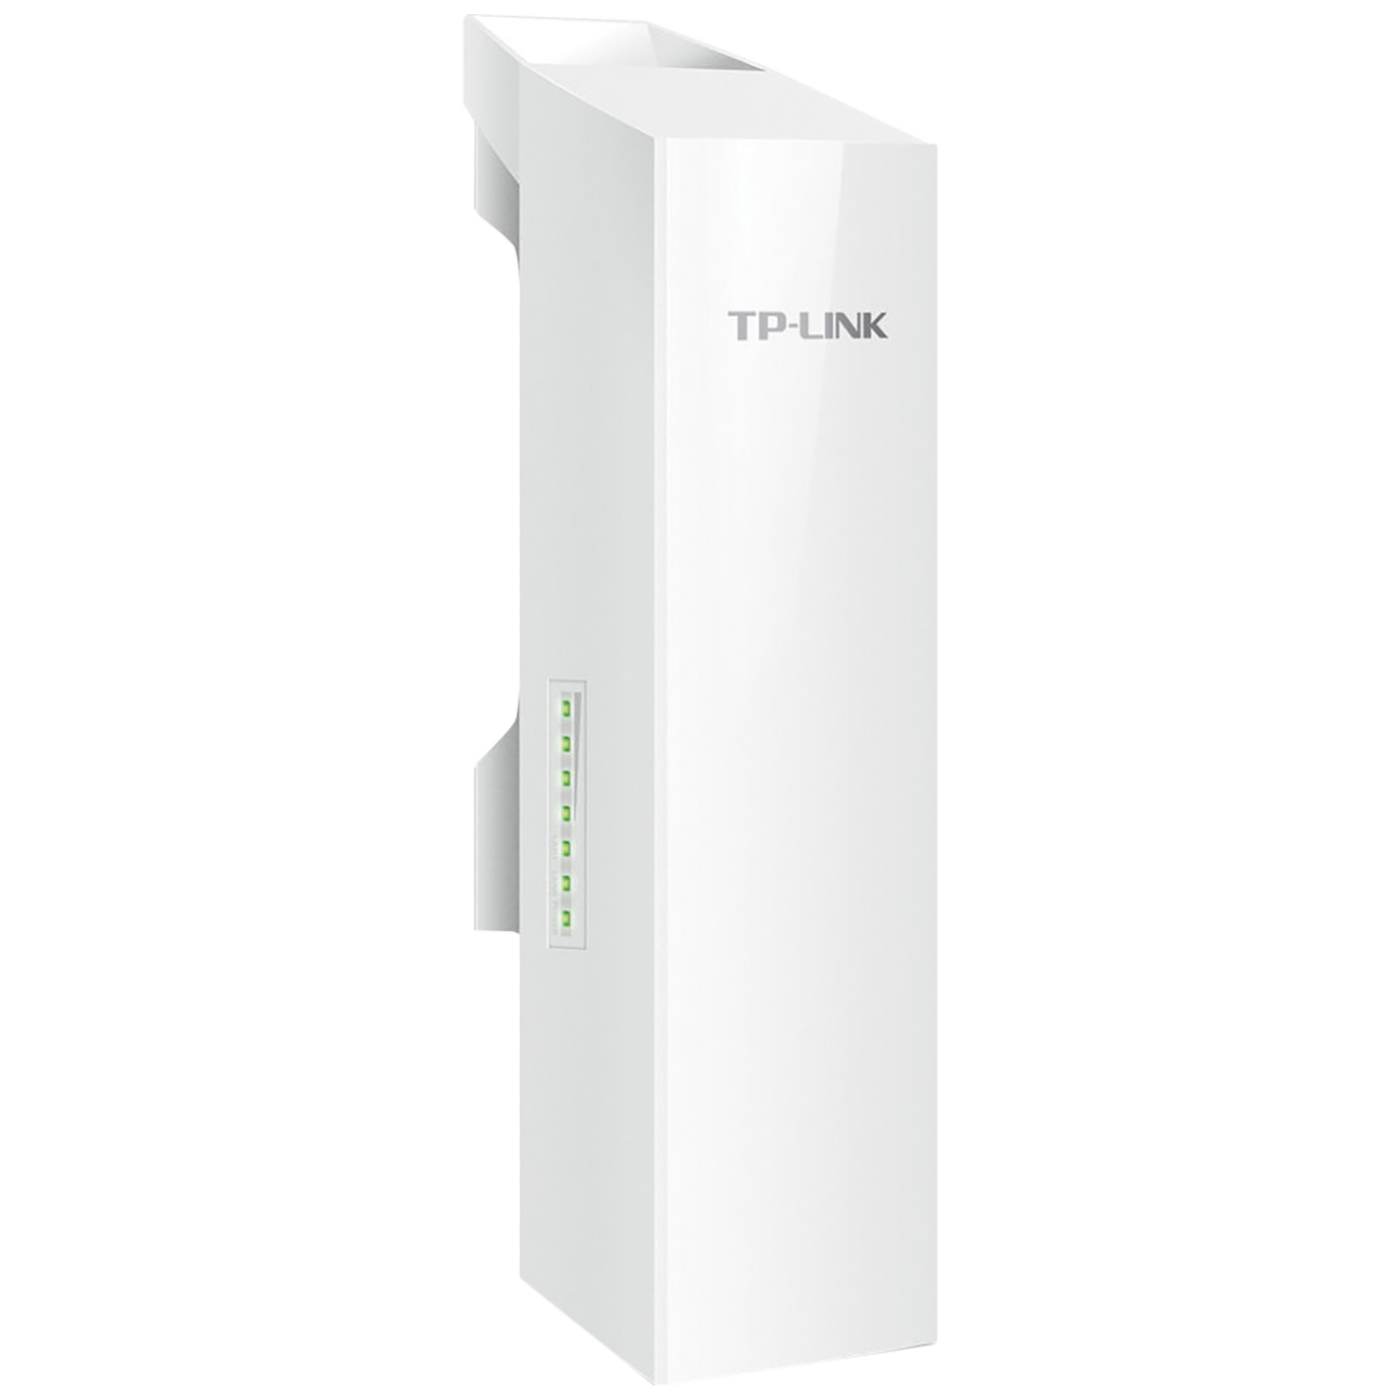 Wireless N Access Point, 300Mbps, 13dBi, 5GHz